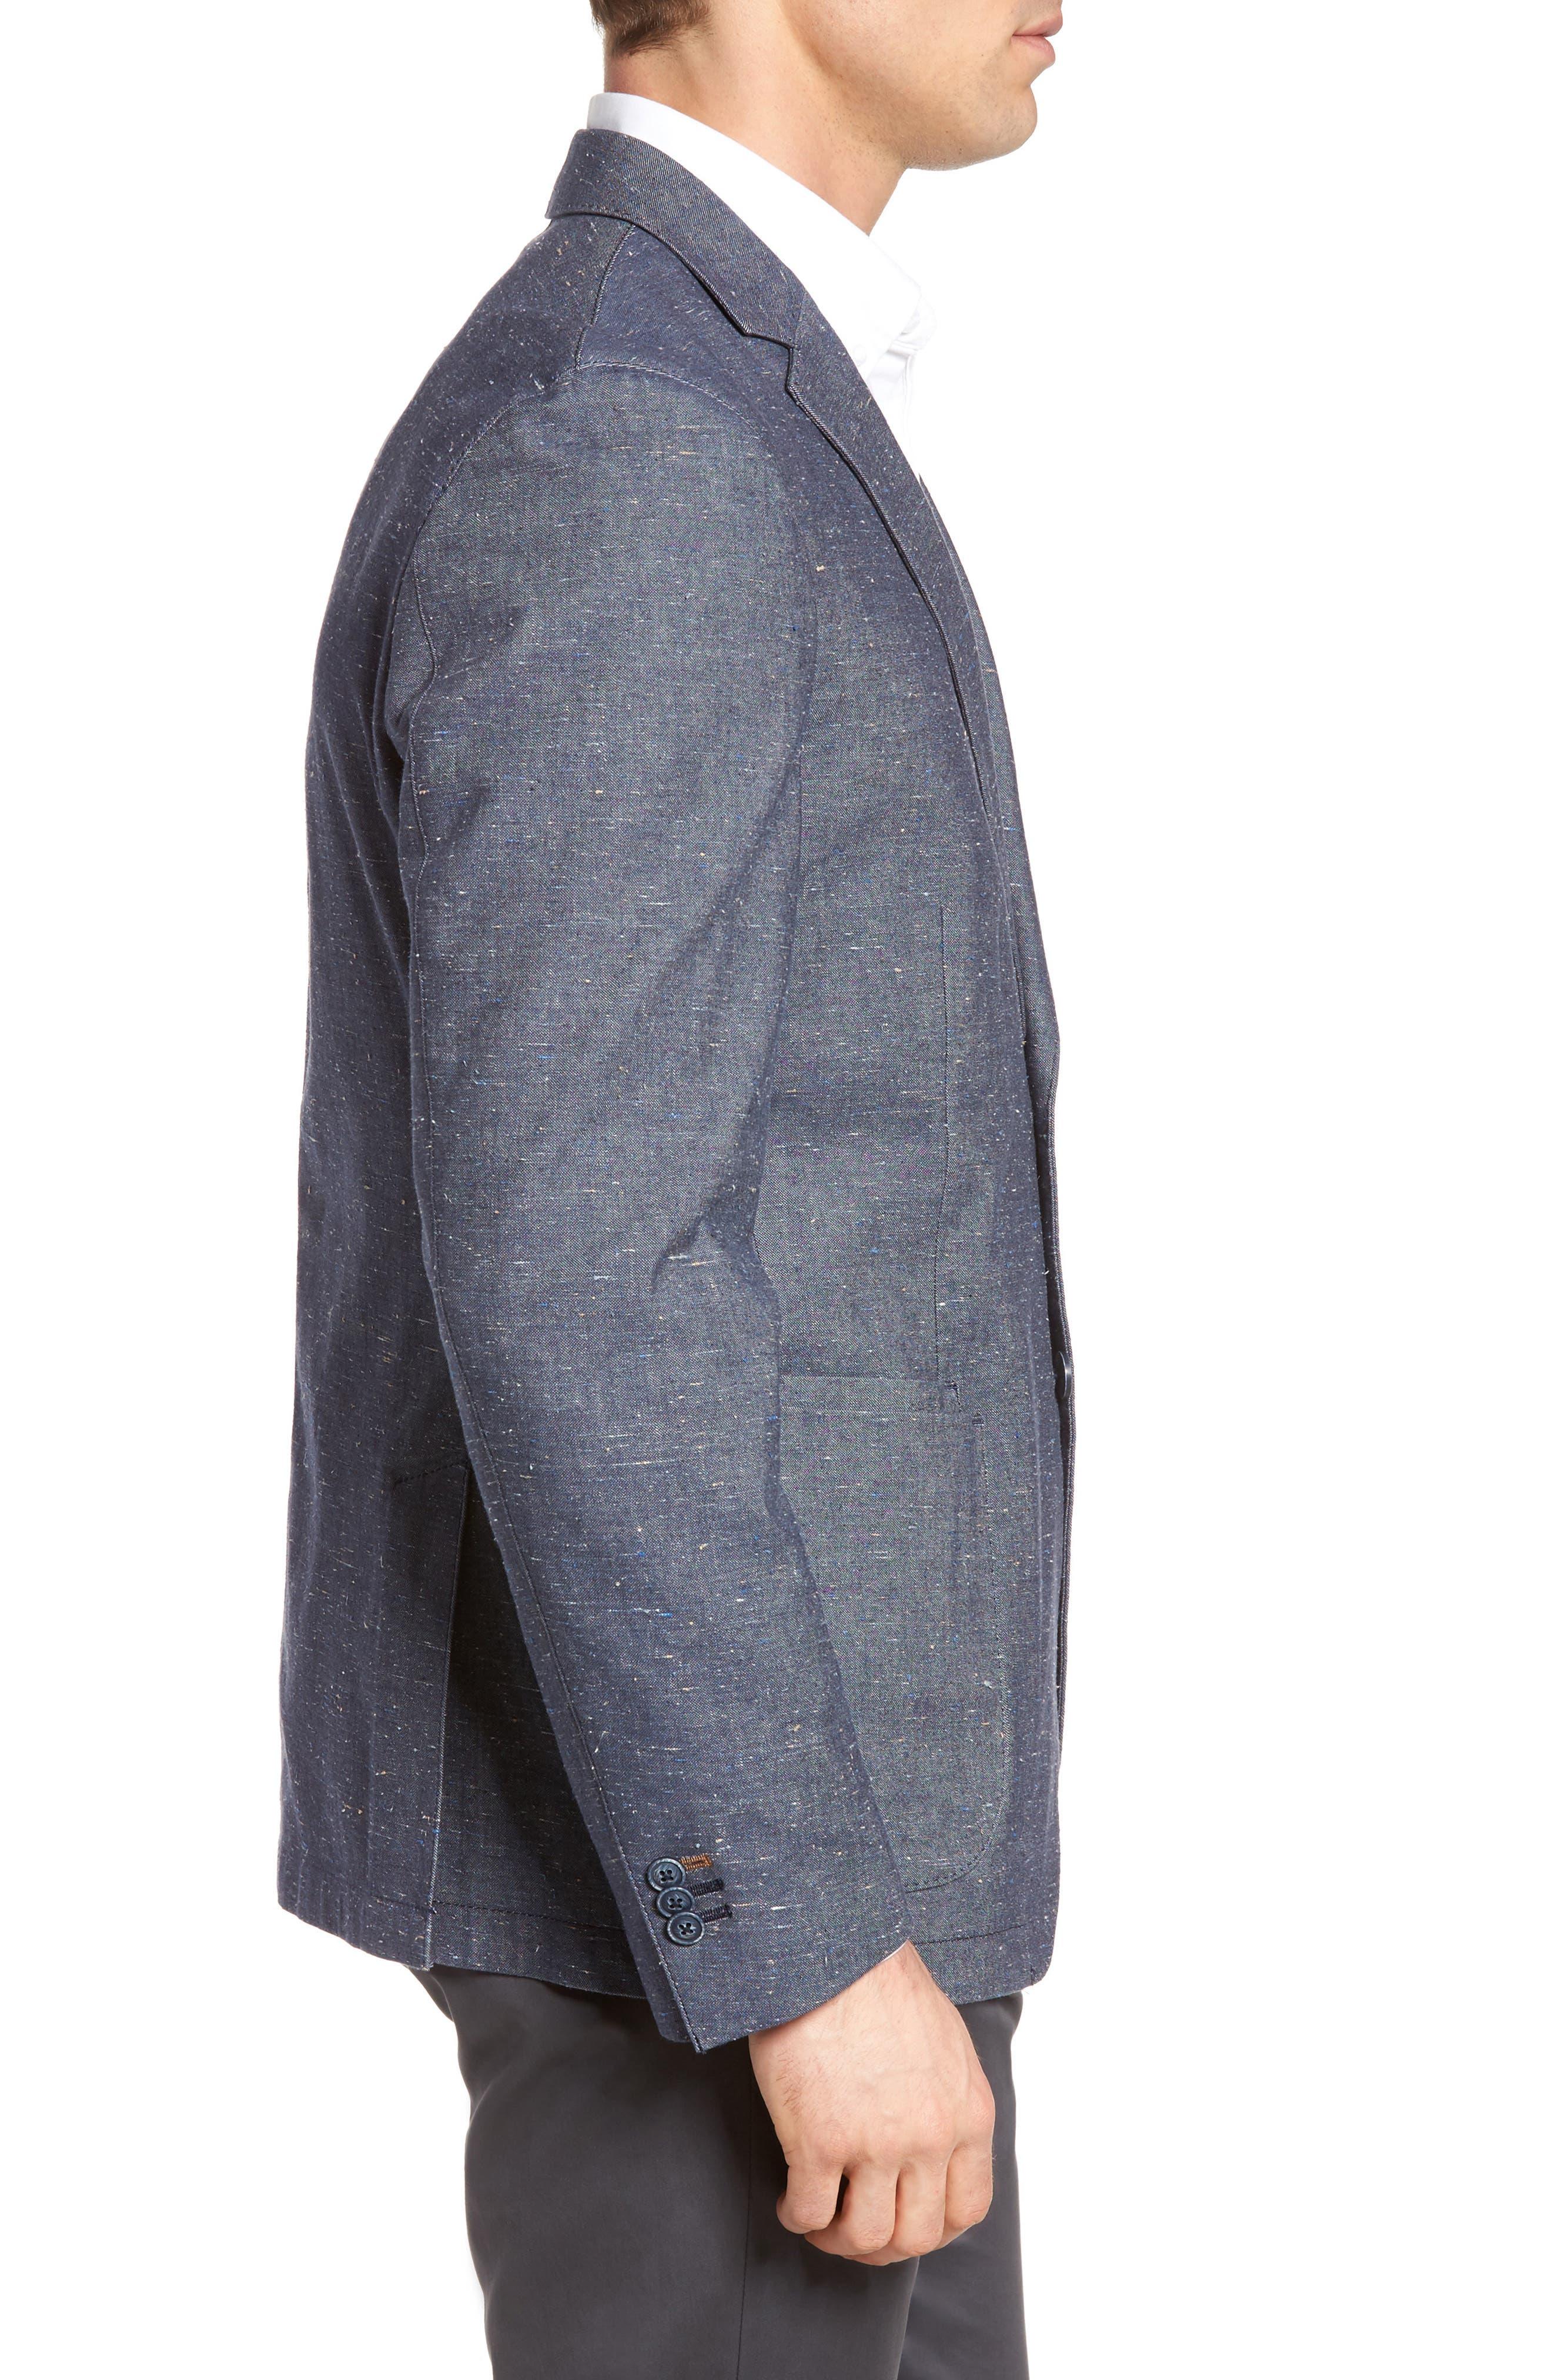 Draper Herringbone Sport Coat,                             Alternate thumbnail 3, color,                             420